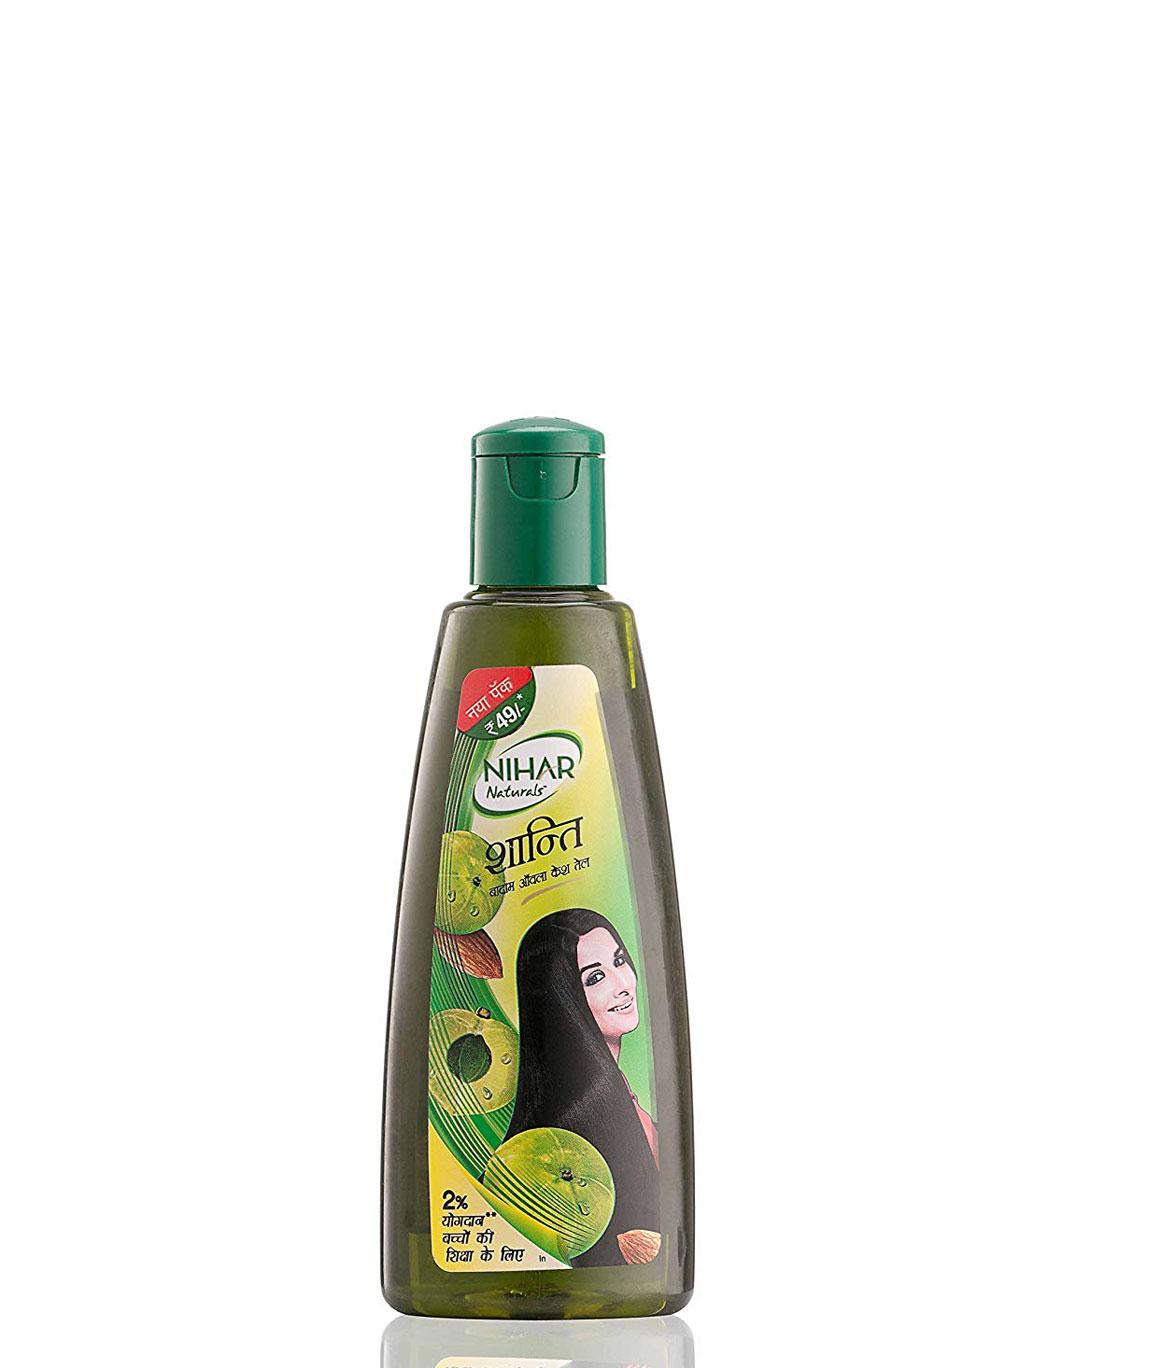 Nihar Naturals Shanti Badam Amla Hair Oil, 175ml